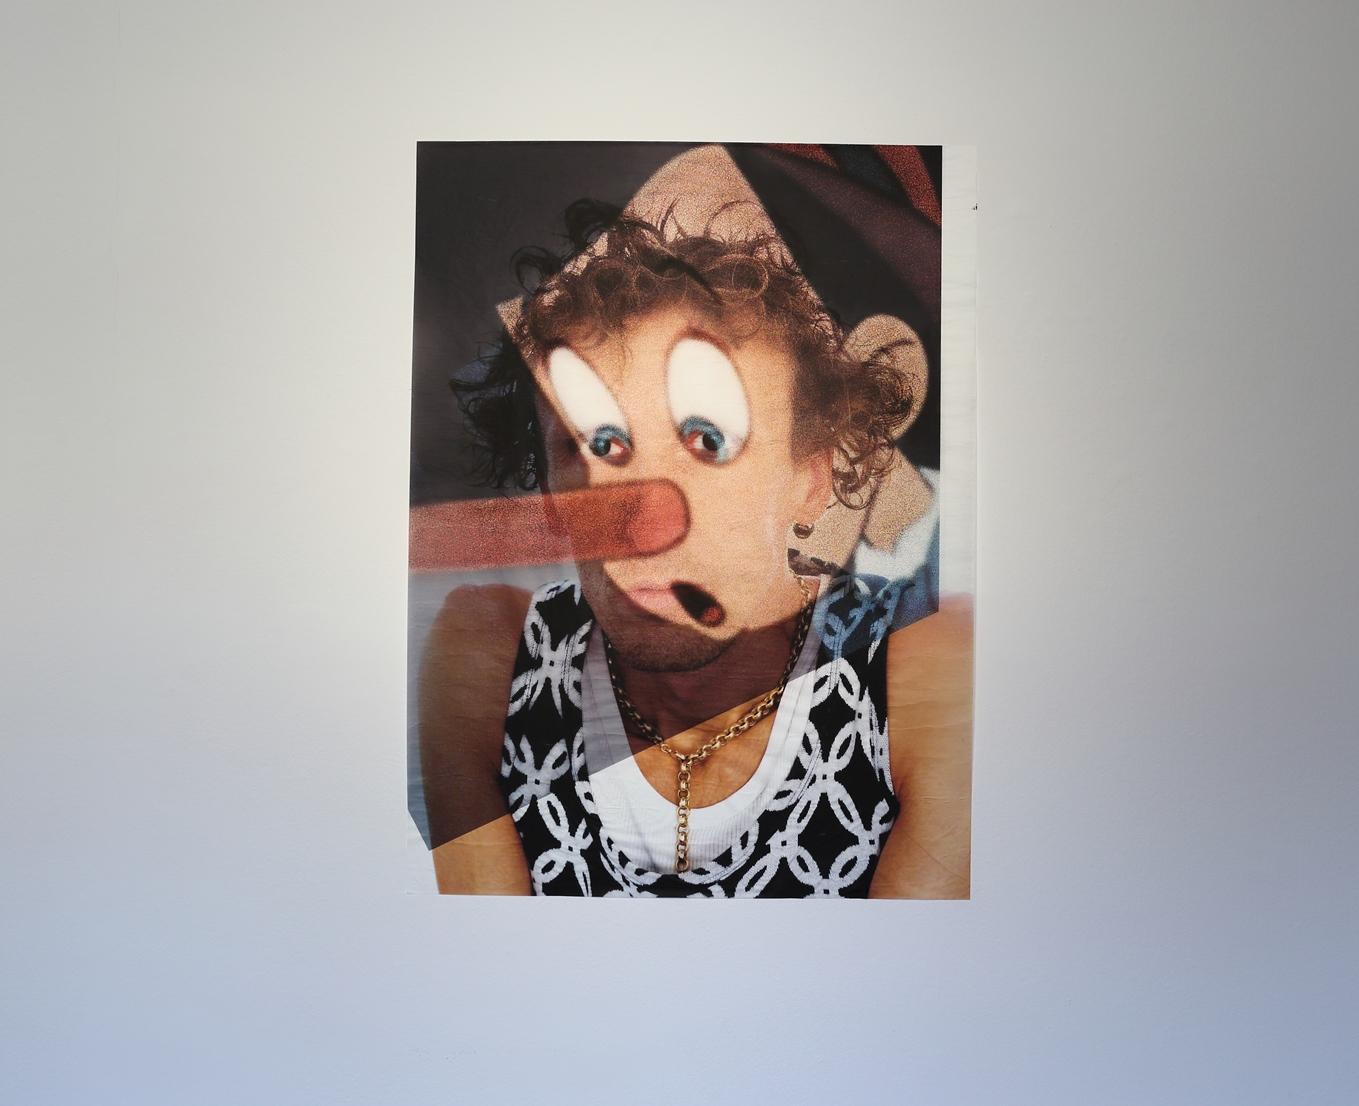 Marina Faust, Florian as Pinocchio zcyklu Fusions, 2014